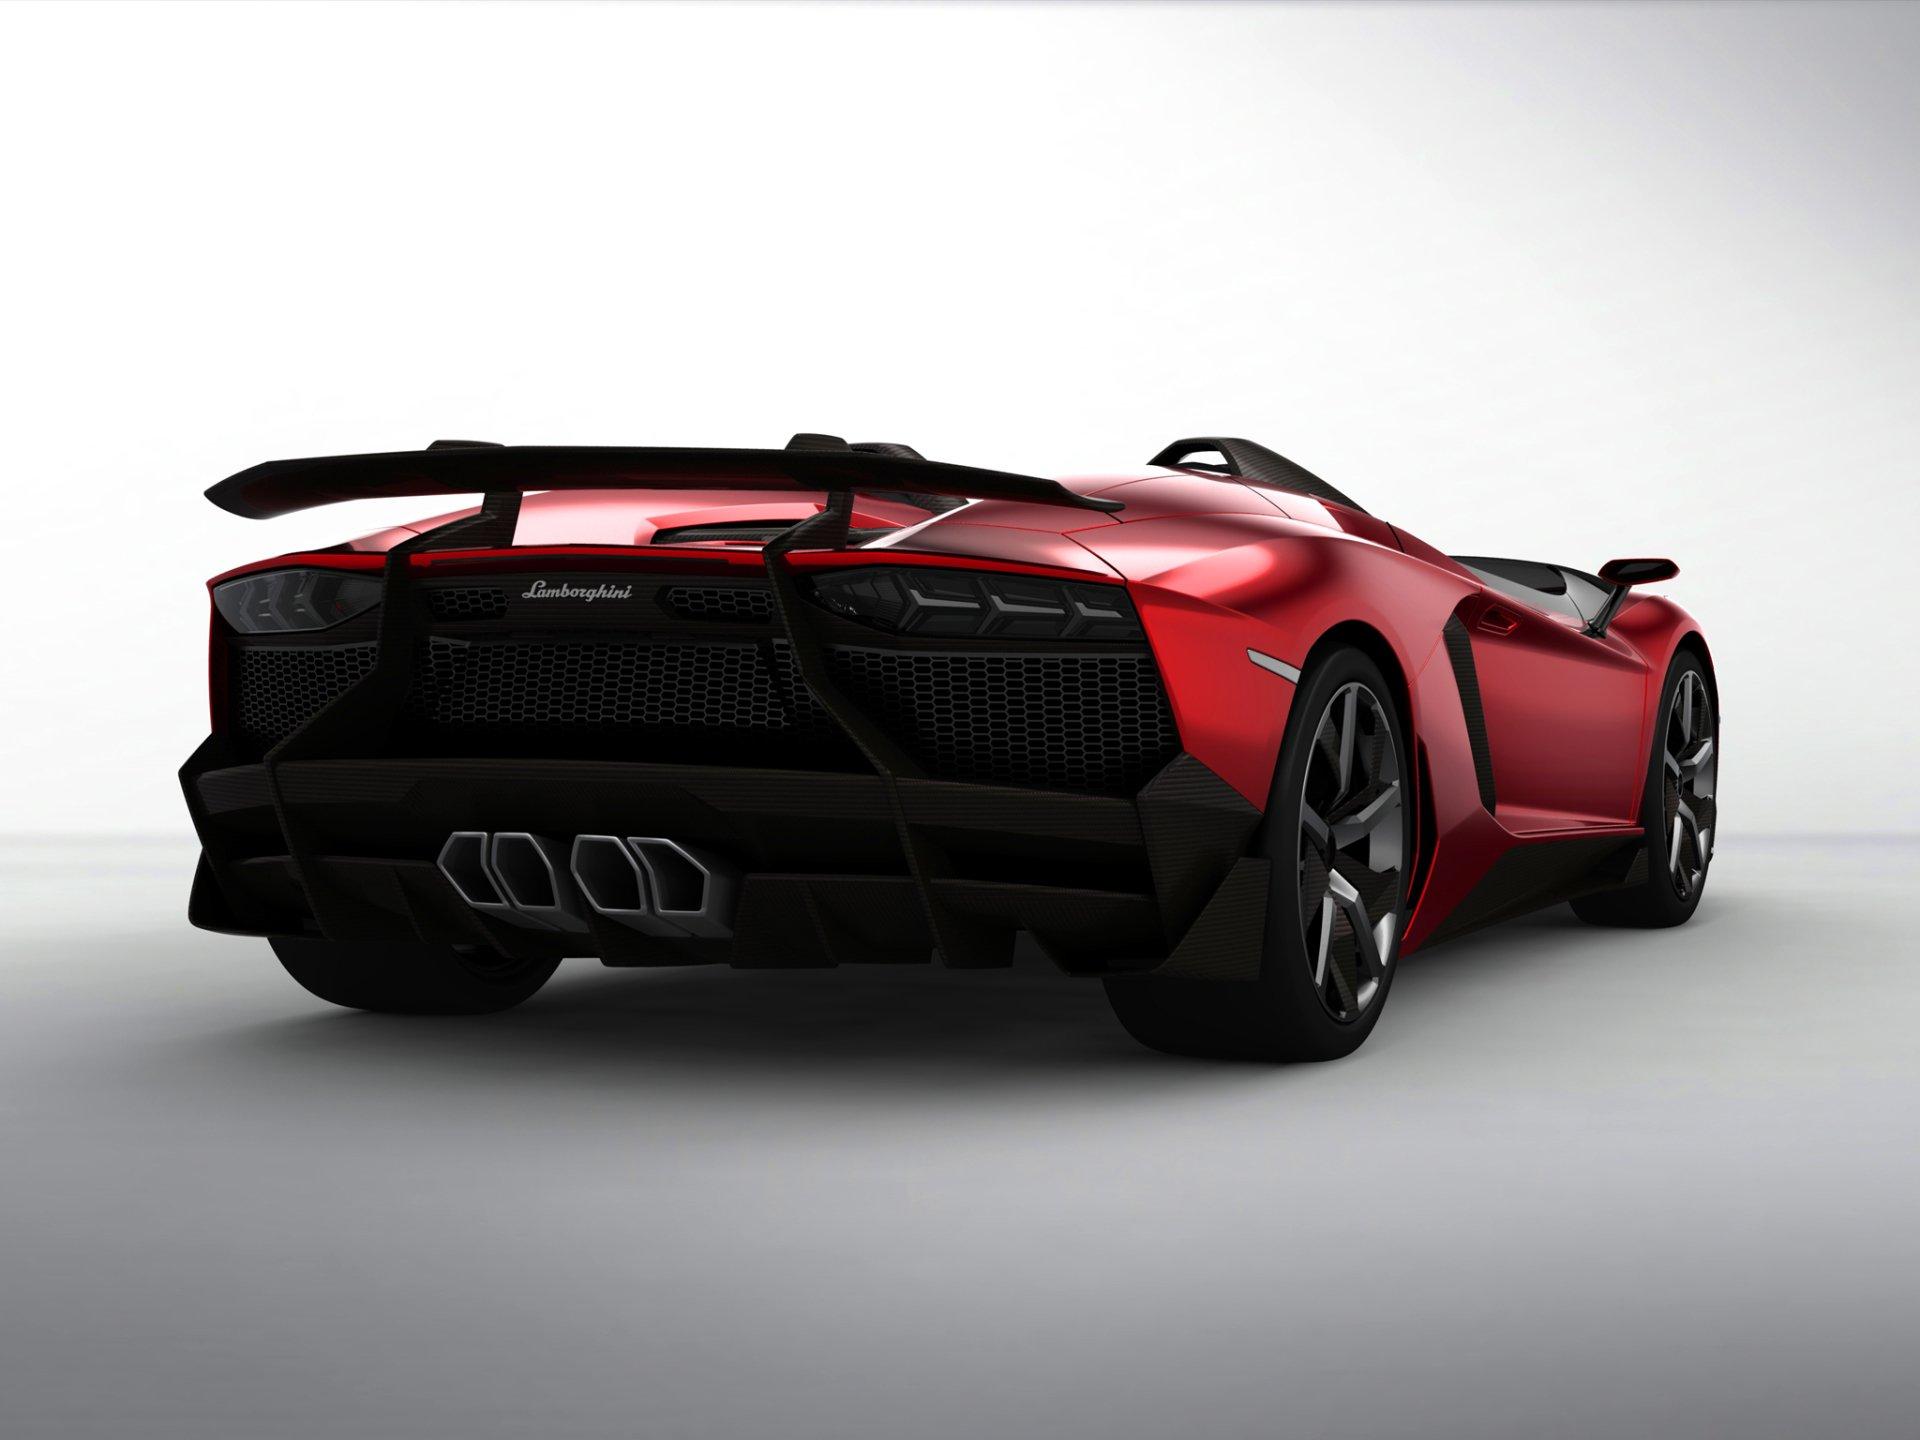 Lamborghini Aventador J '2012 HD Wallpaper | Background ...